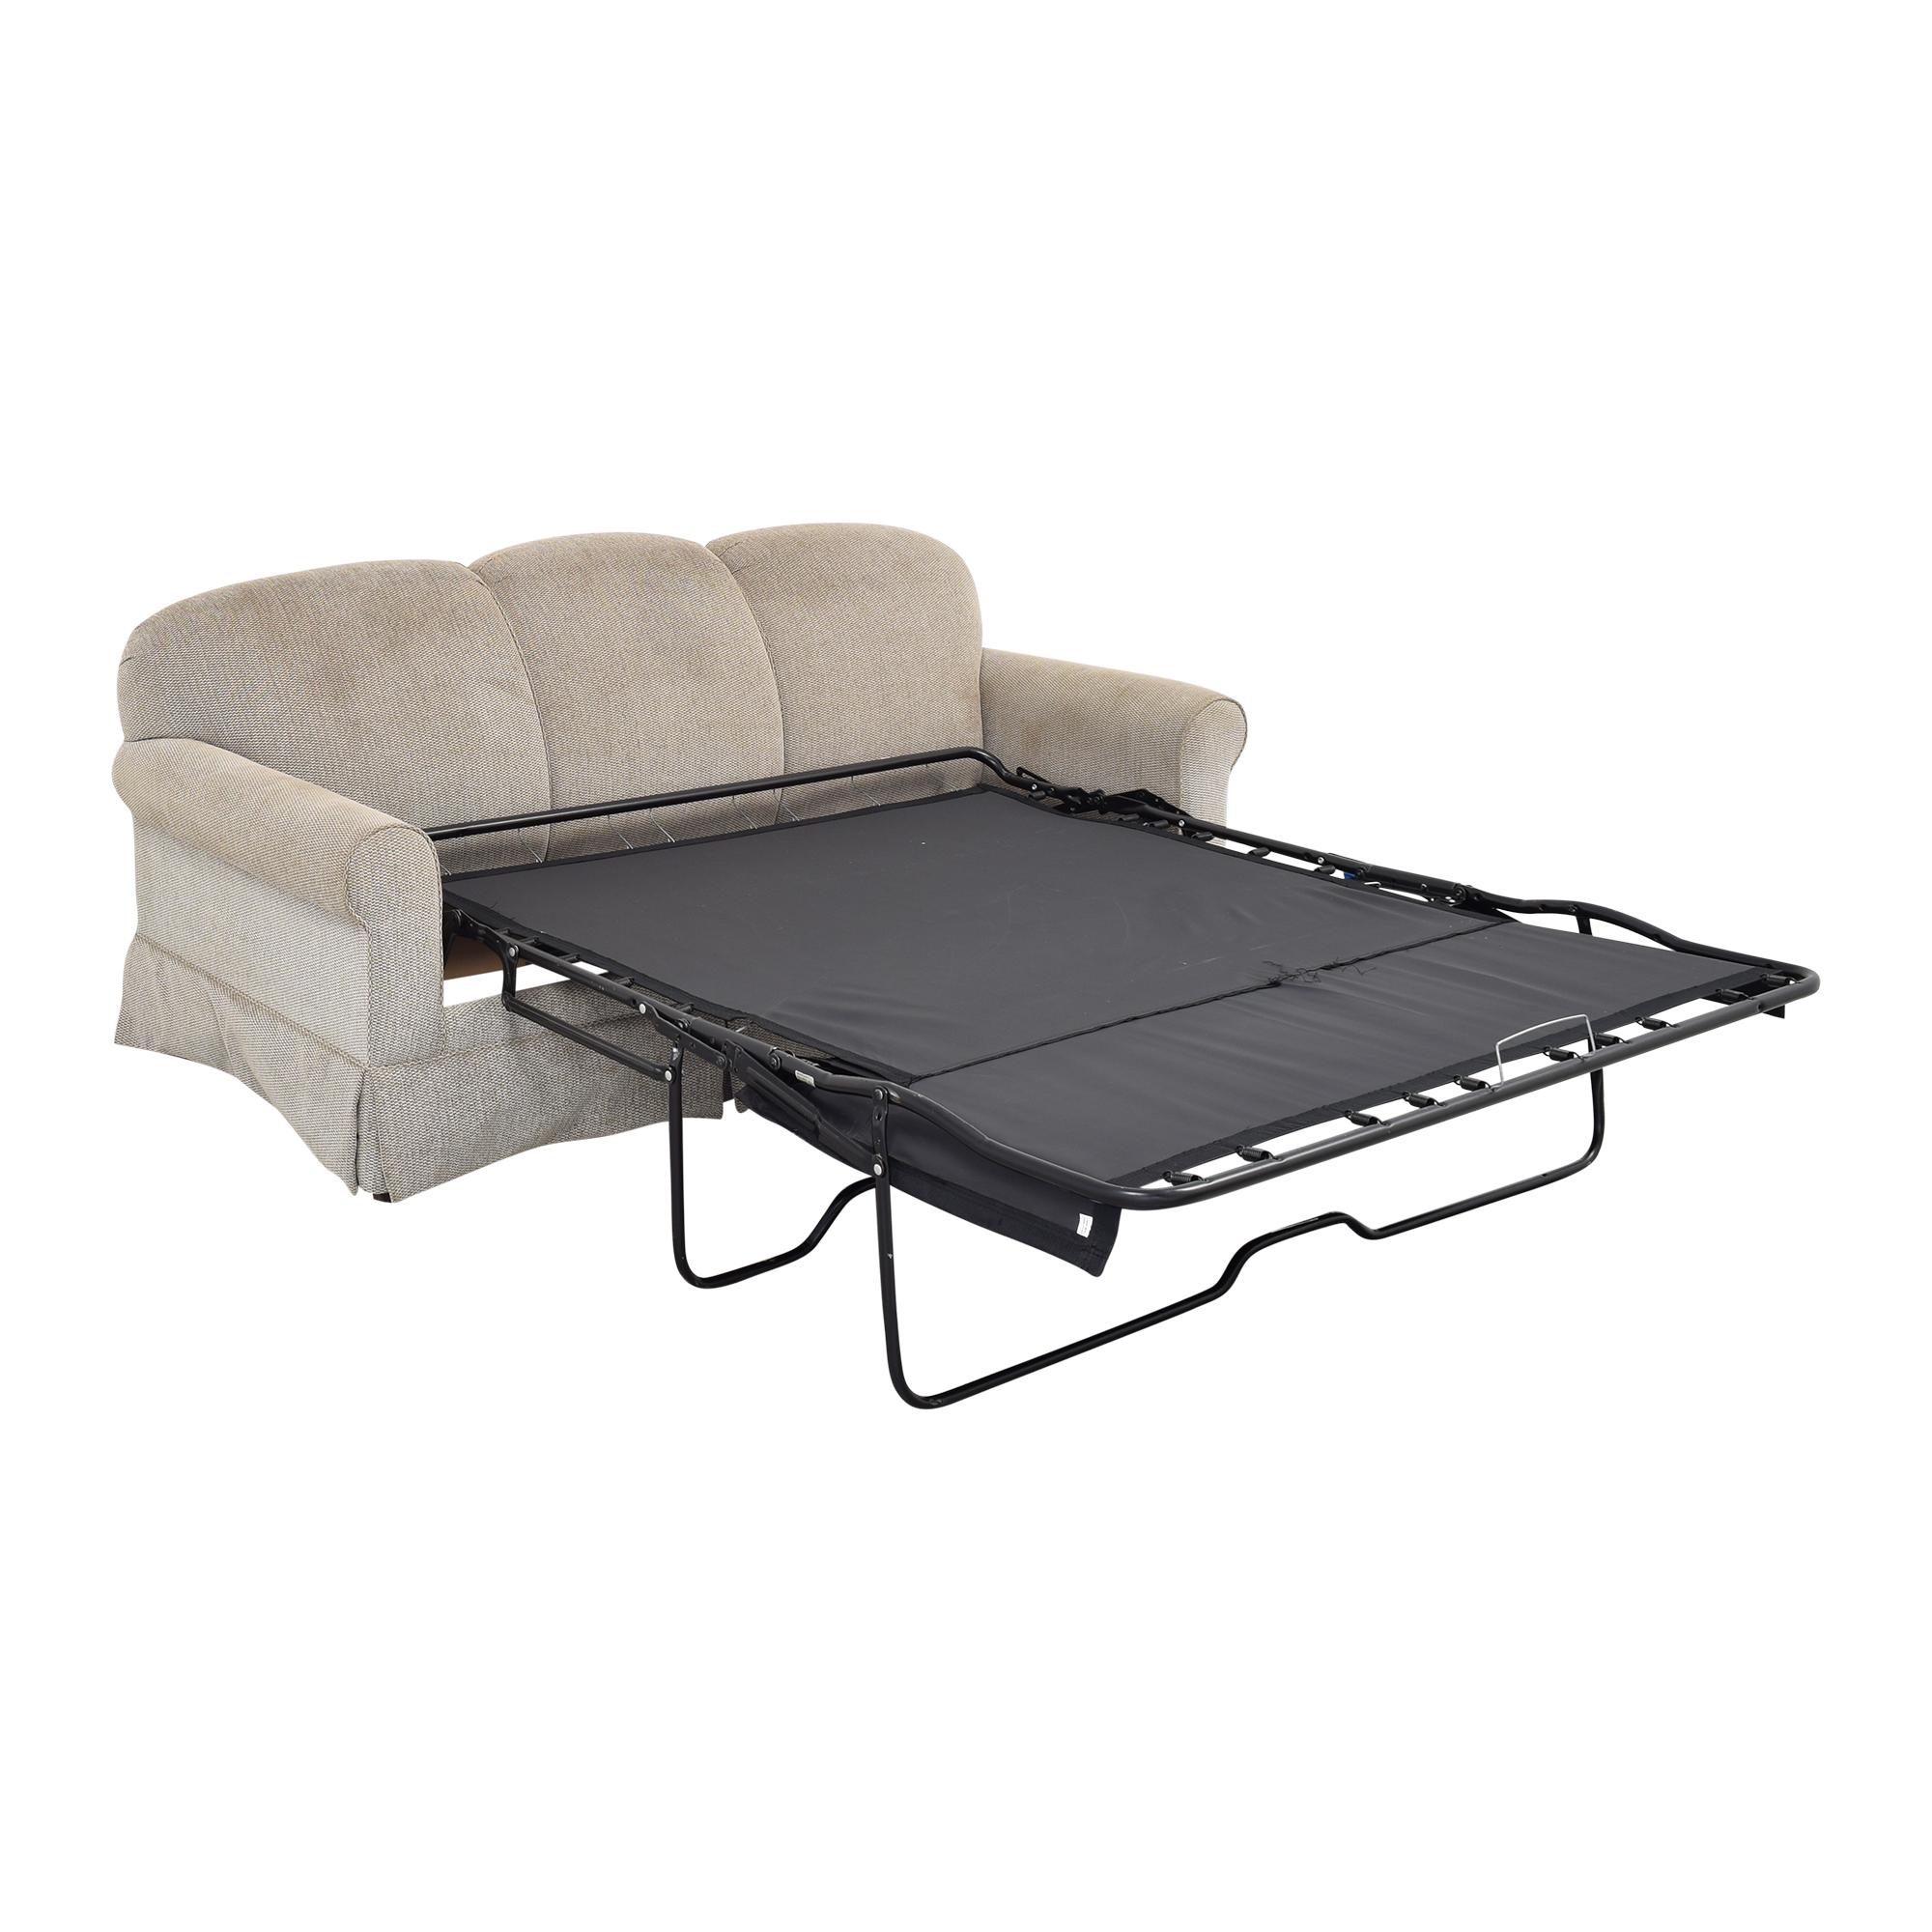 Craftmaster Furniture Craftmaster Full Size Sleeper Sofa nyc